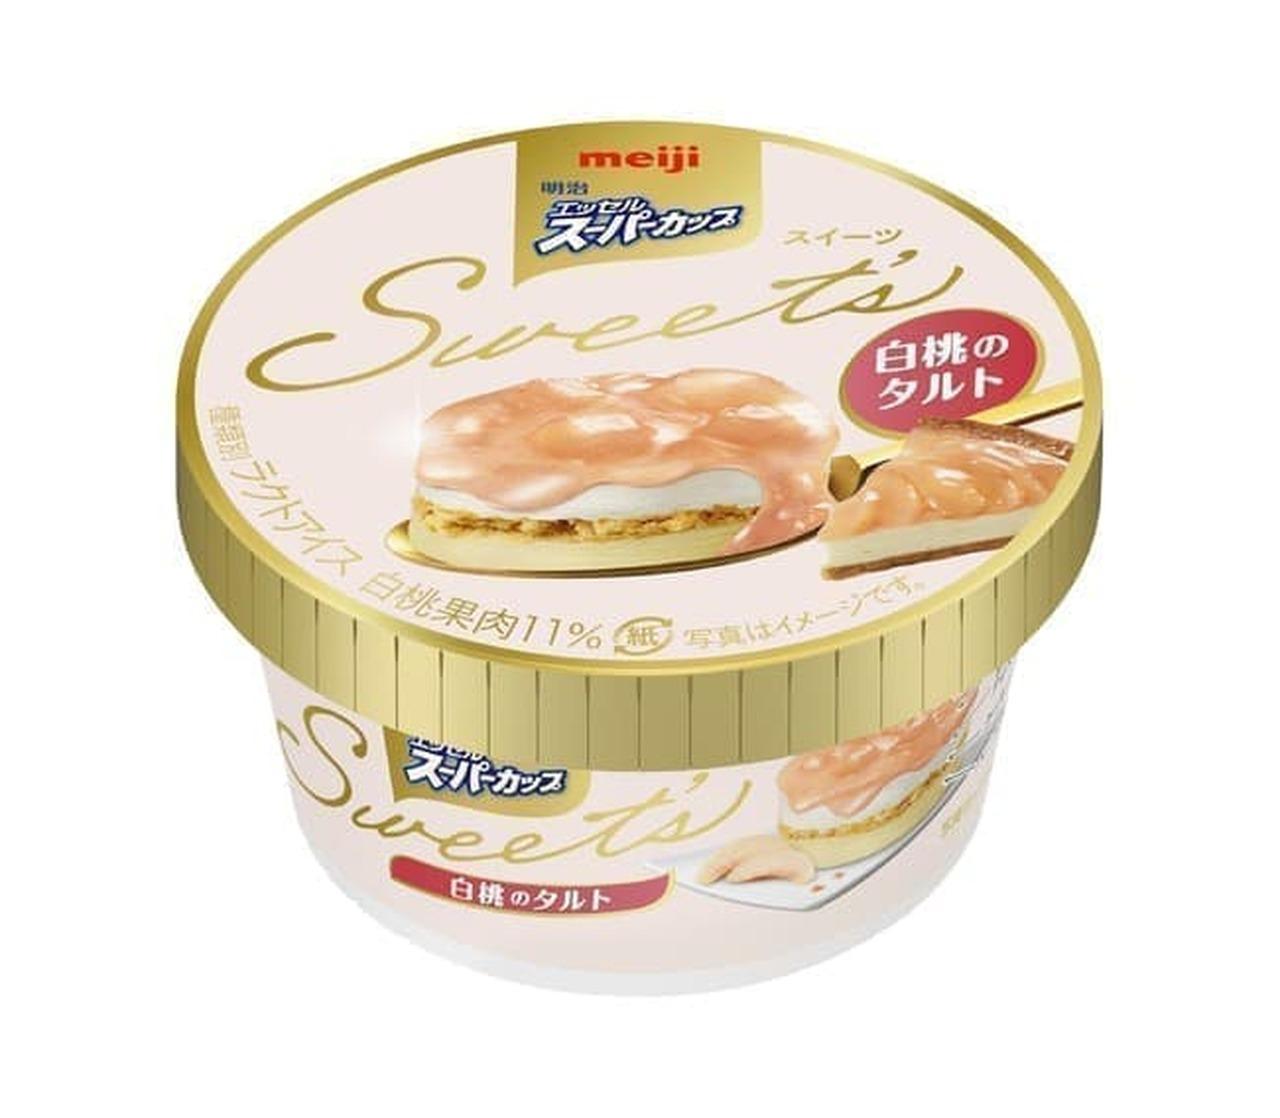 Meiji Essel Super Cup Sweet 's White Peach Tart